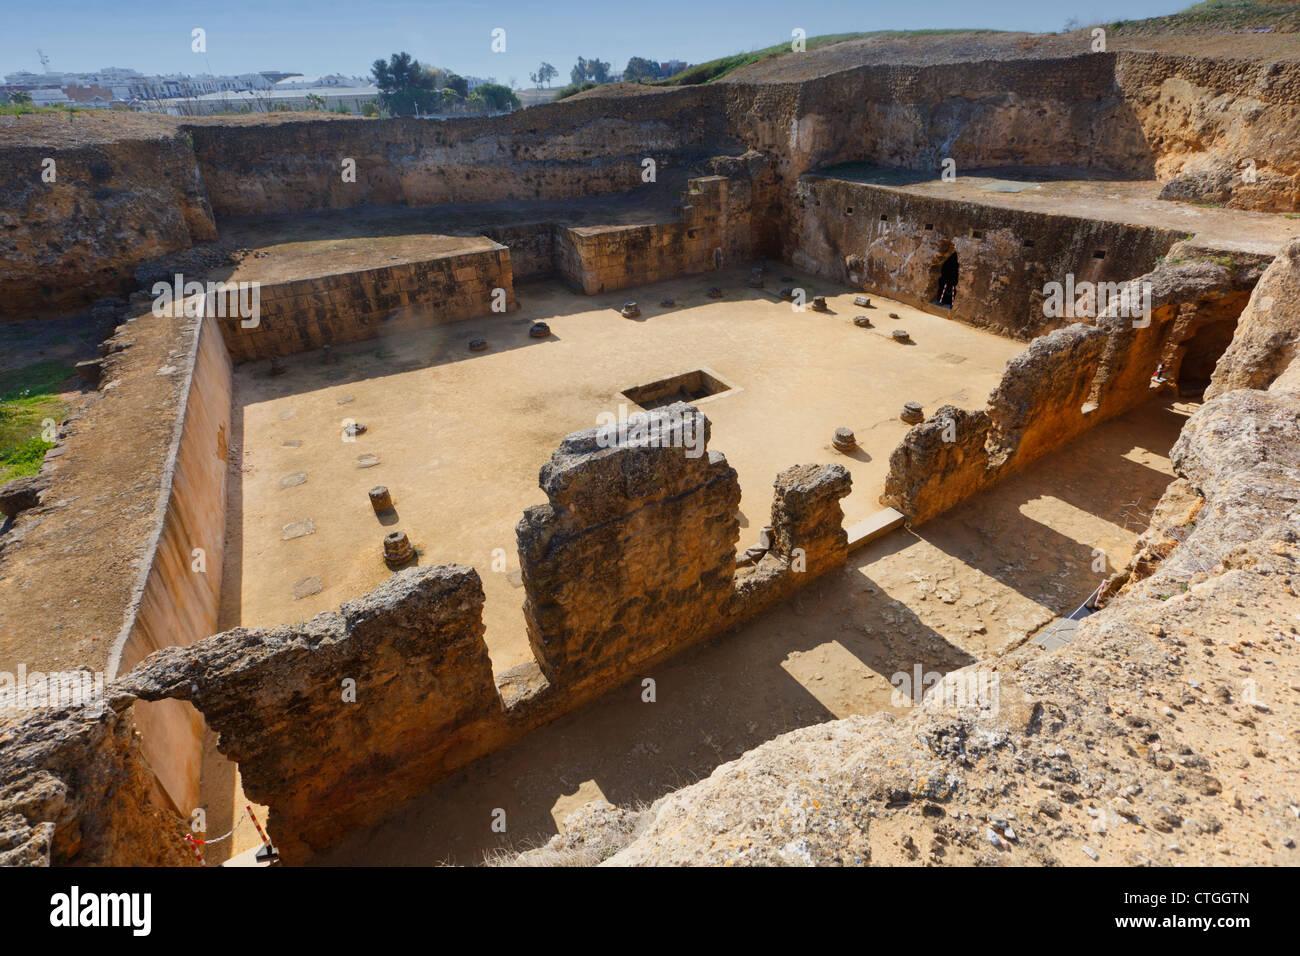 The Archaeological Complex, Carmona, Seville Province, Spain. Tumba de Servilia, the Tomb of Servilia. - Stock Image